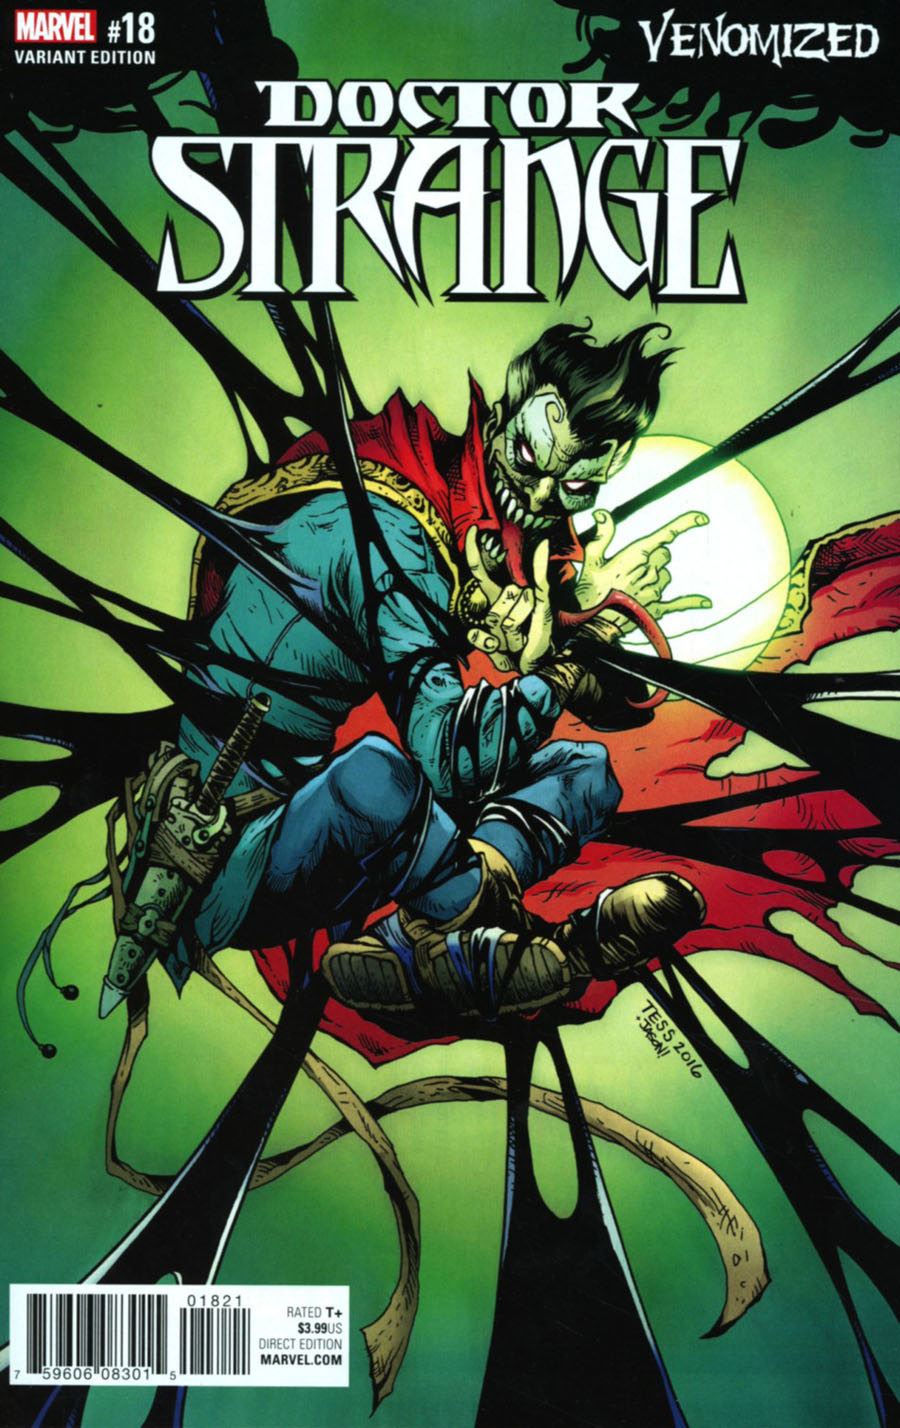 Doctor Strange Vol 4 #18 Cover B Variant Tess Fowler Venomized Cover